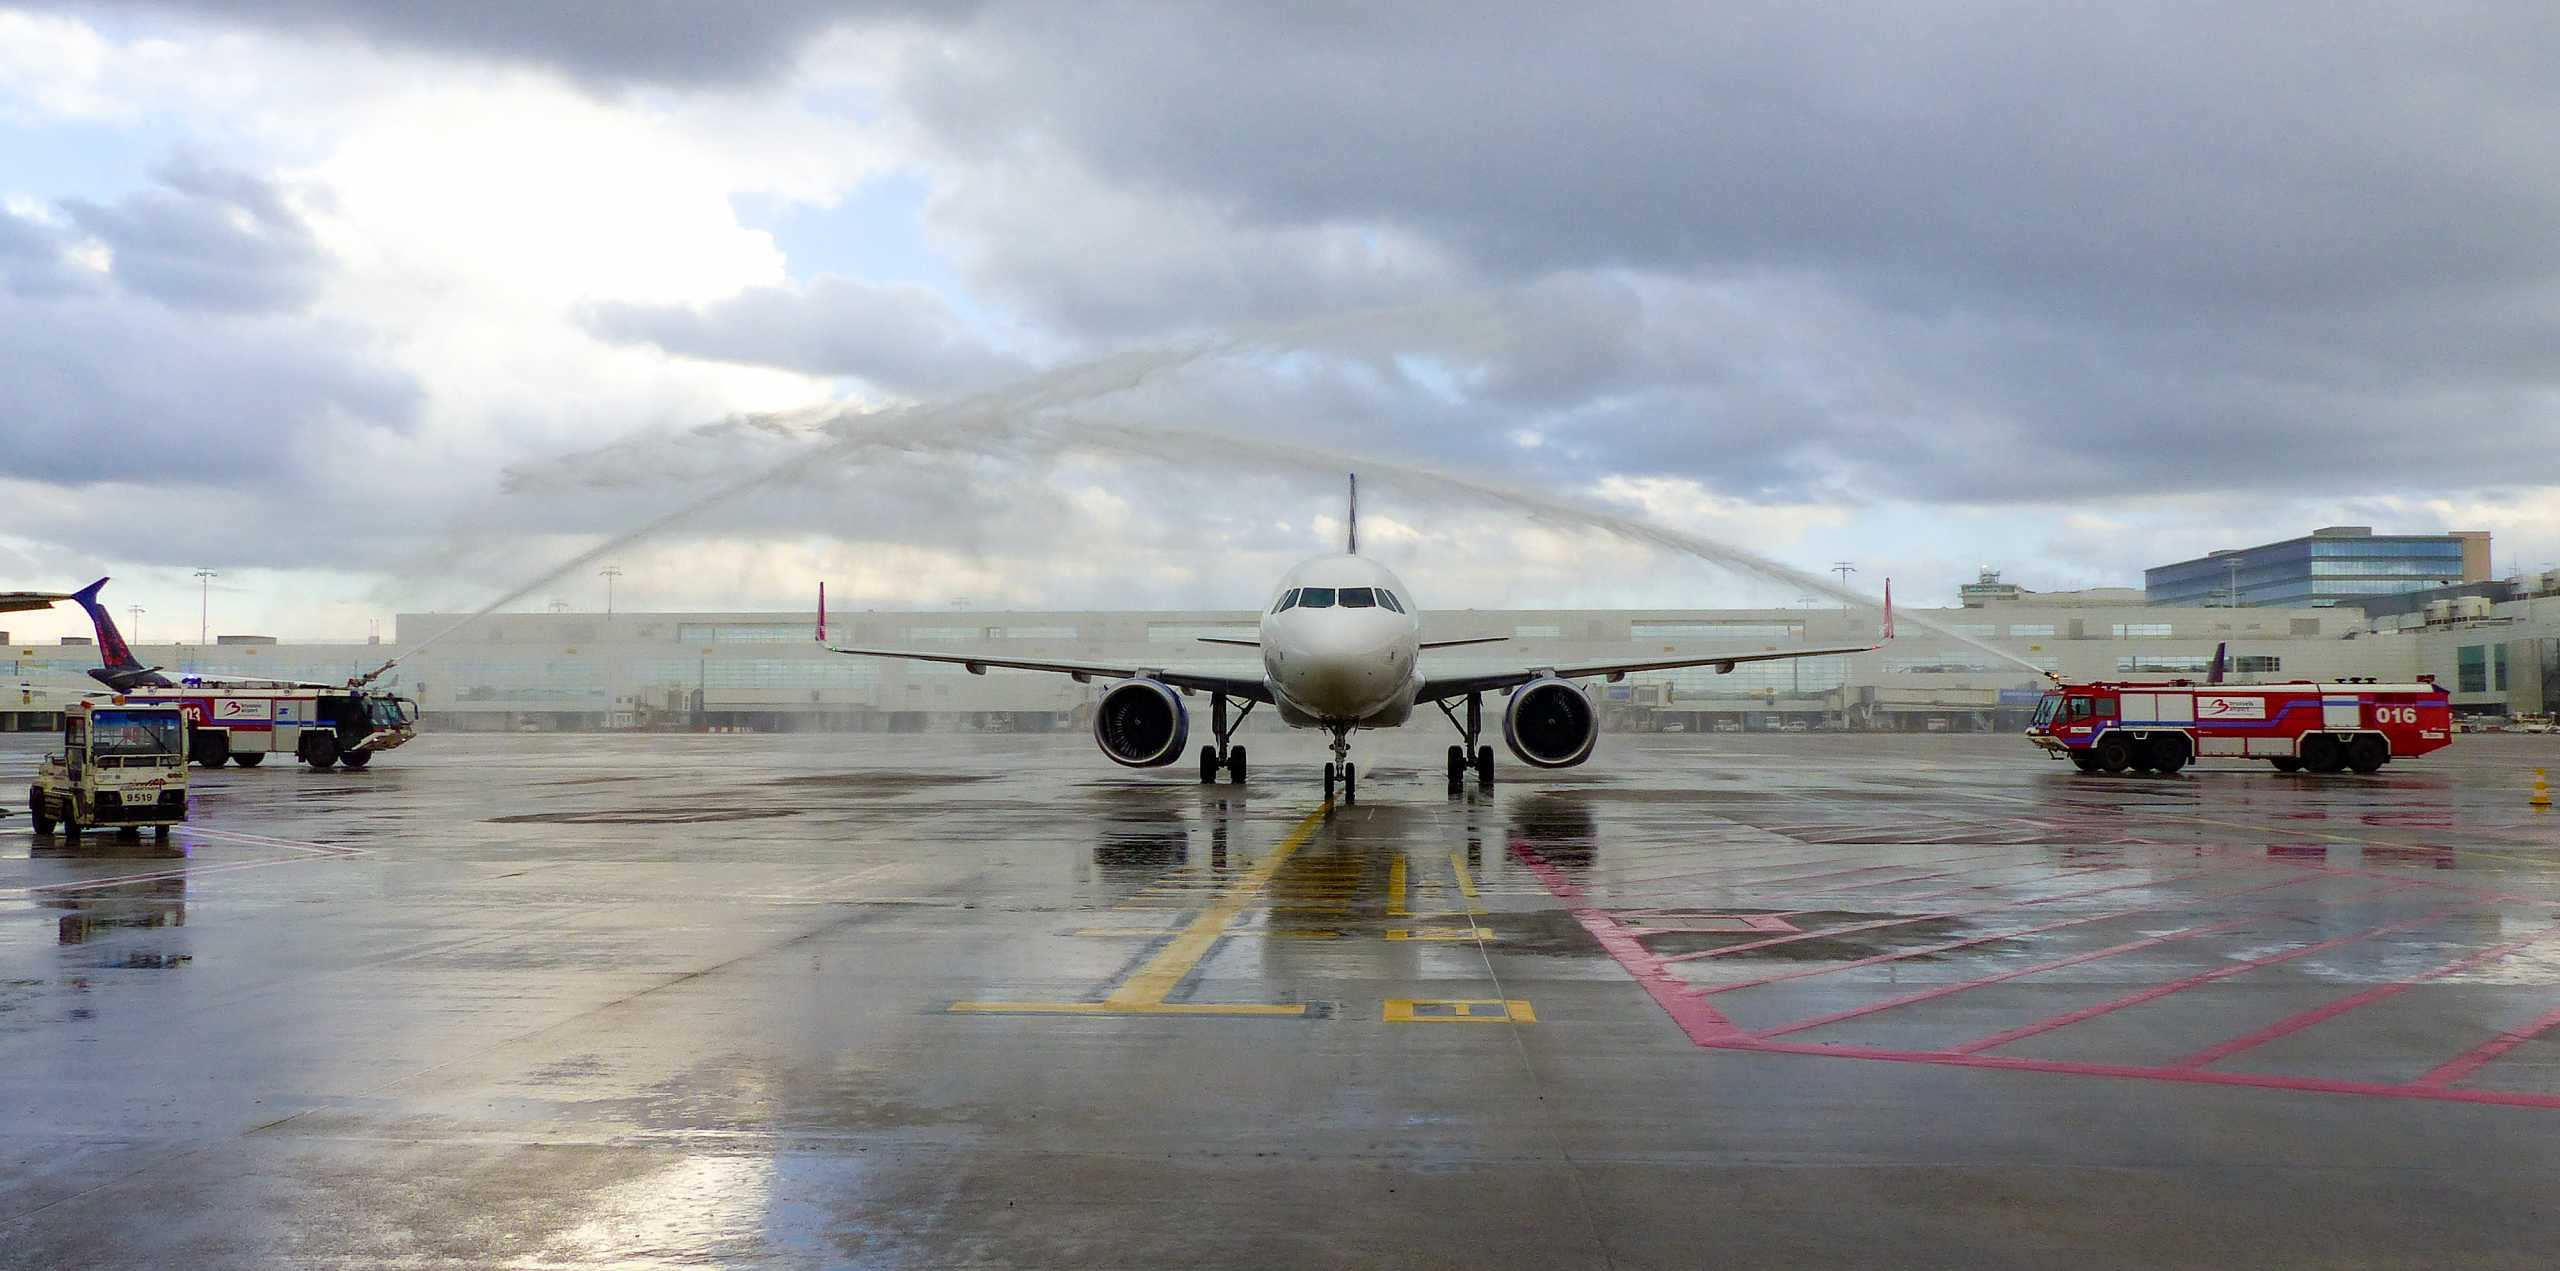 SKY express: Ξεκίνησαν οι πτήσεις από και προς Βρυξέλλες